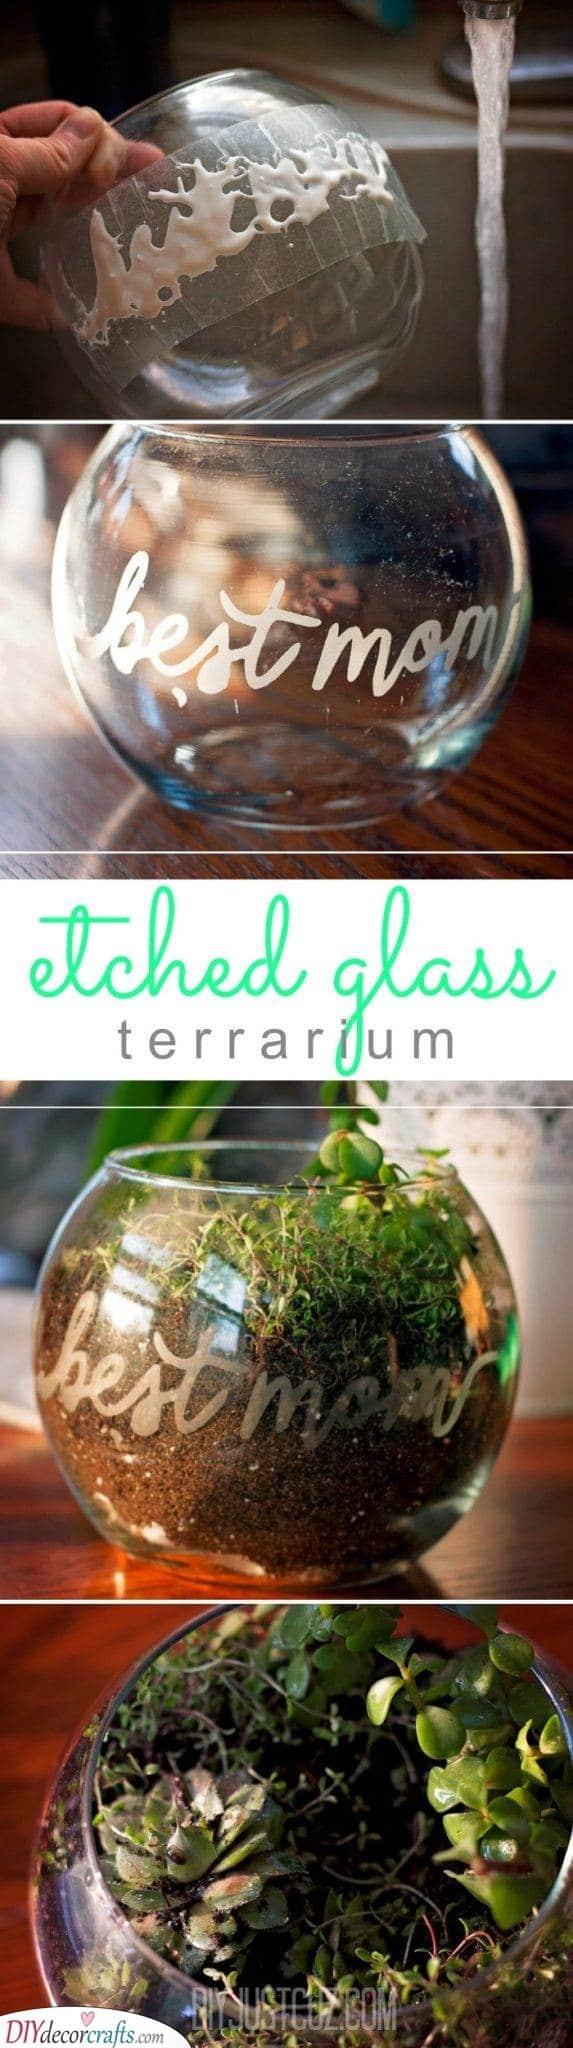 A Glass Terrarium - Christmas Gift Ideas for Grandparents